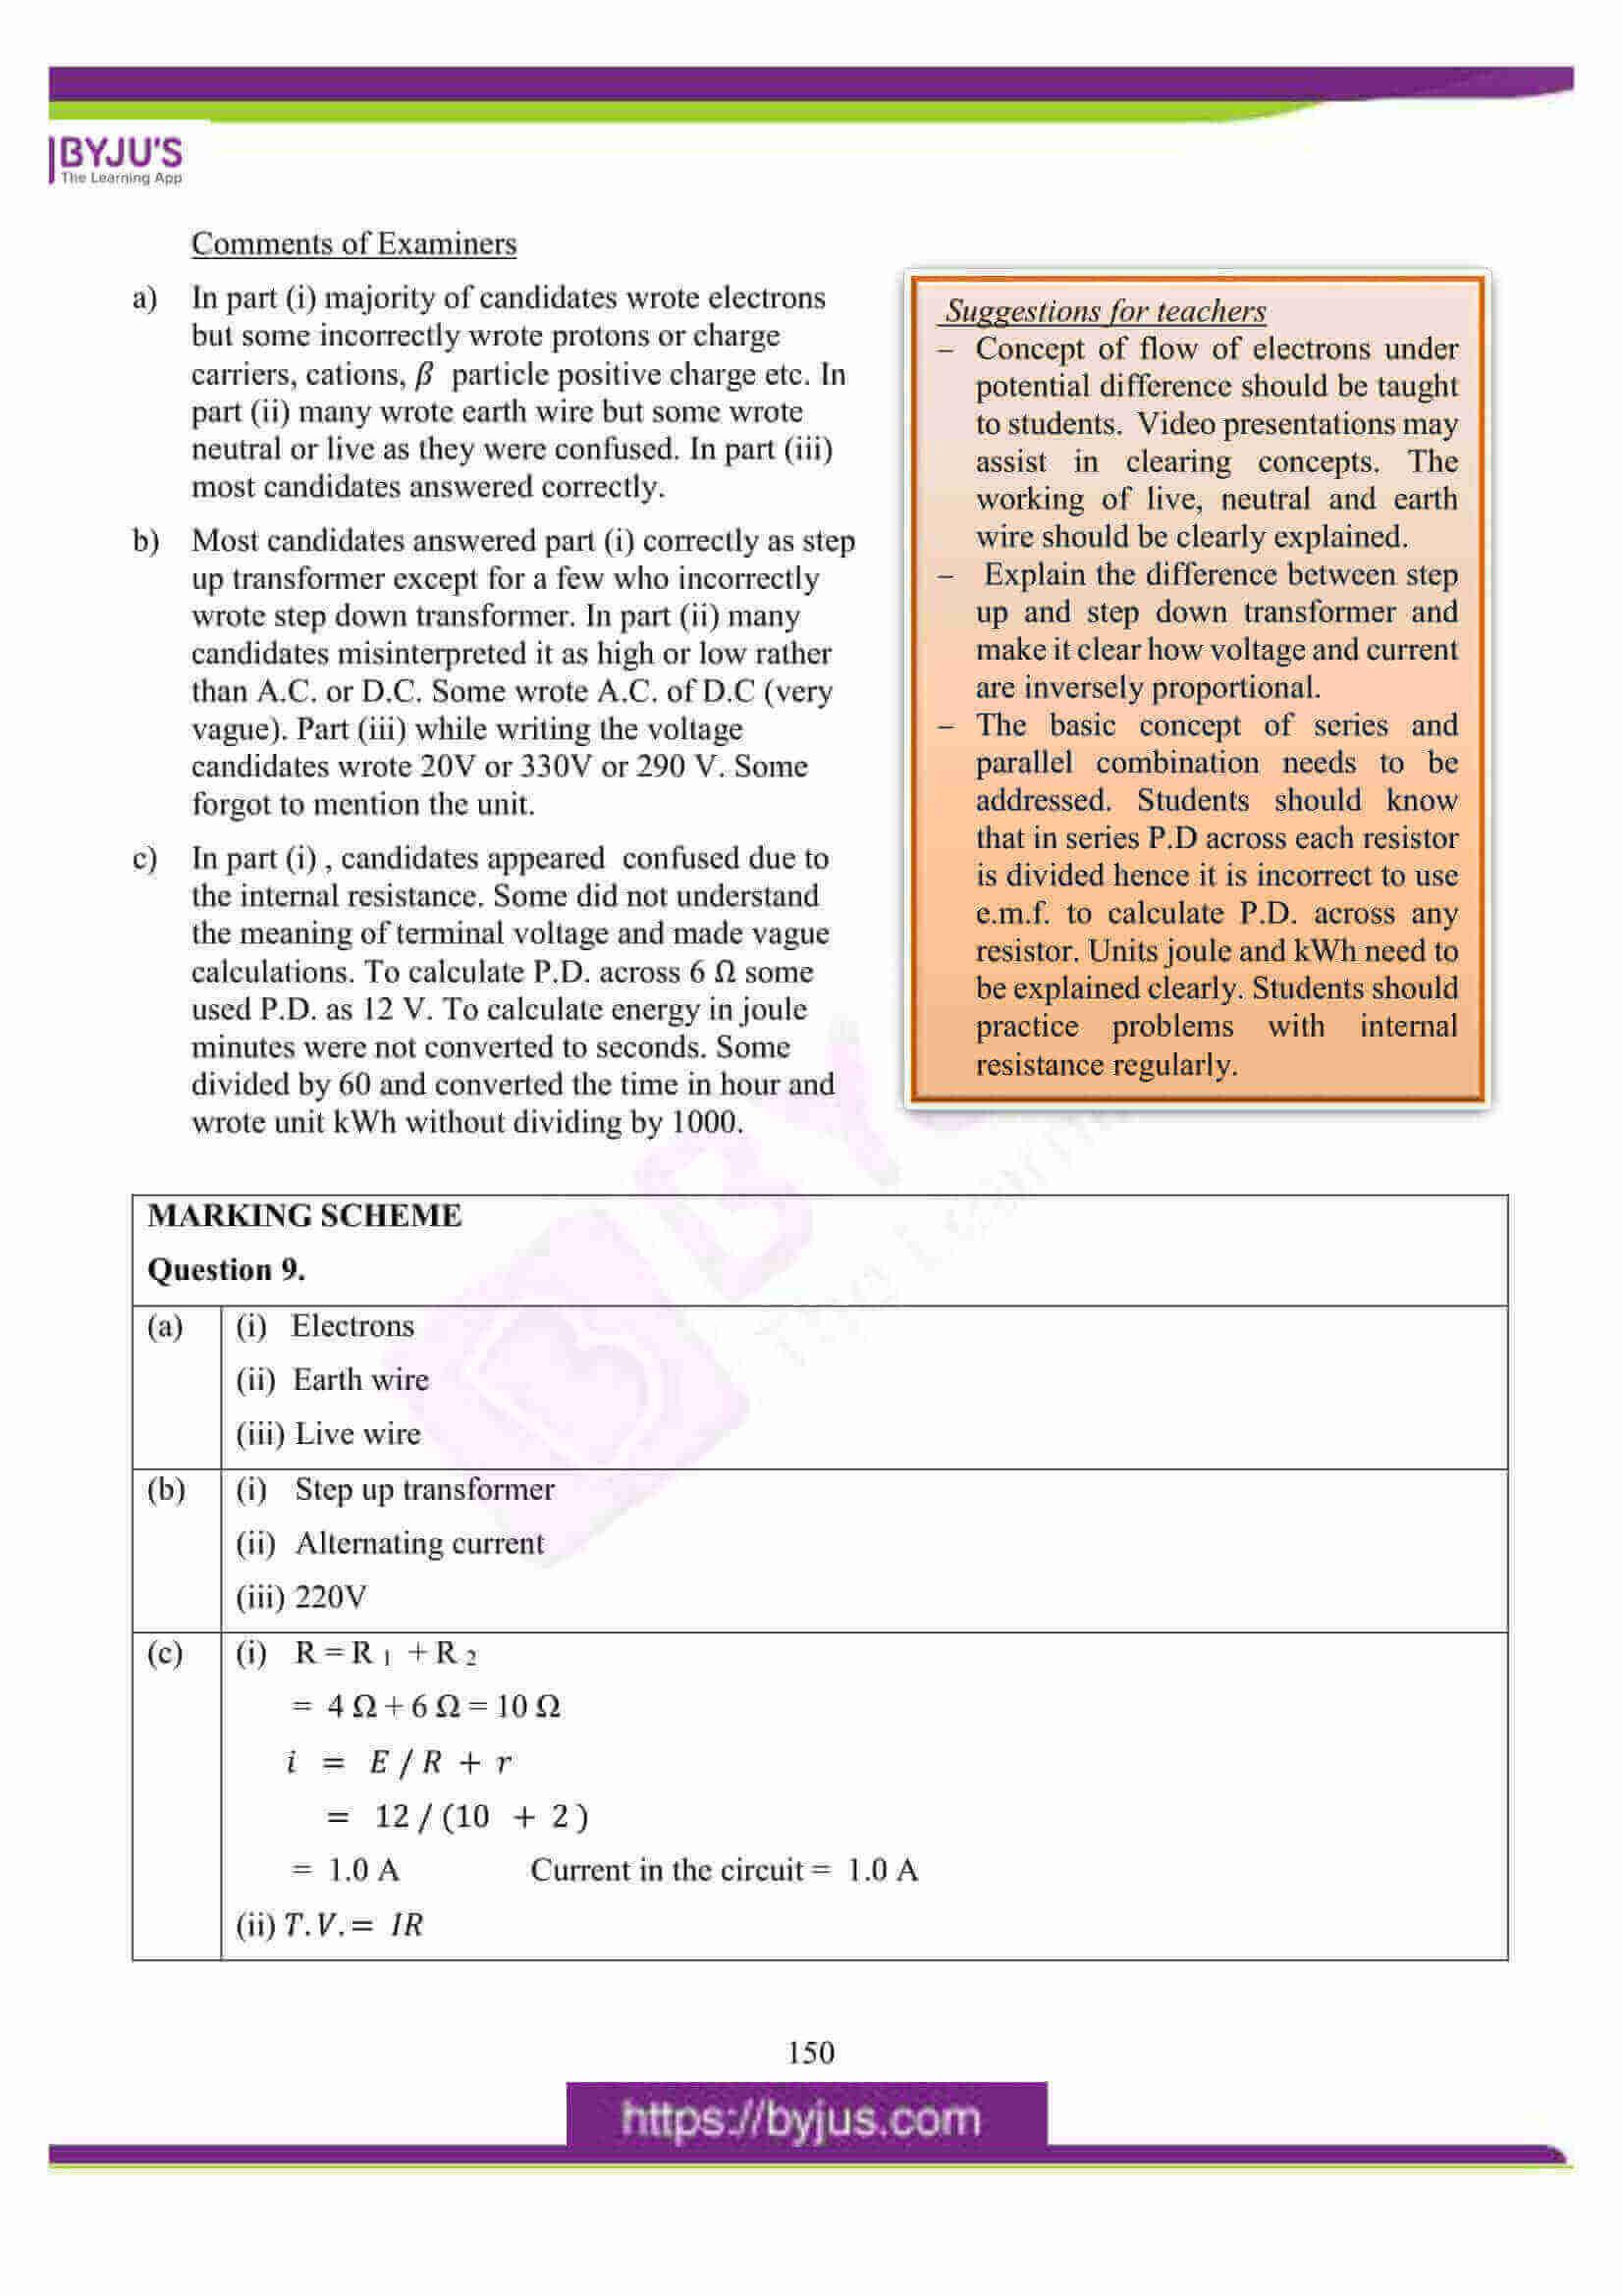 icse class 10 physics question paper solution 2016 15